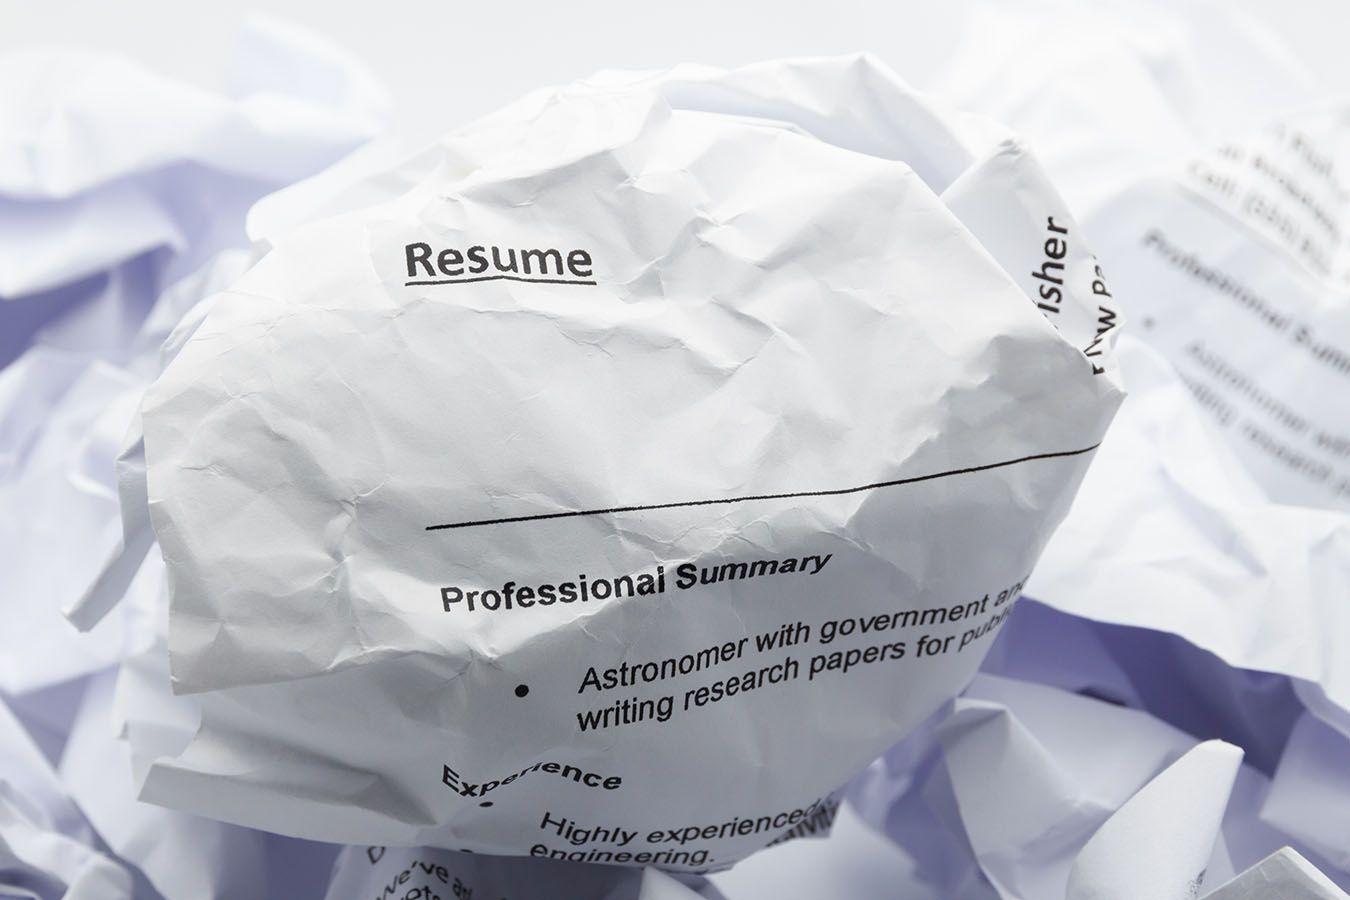 10 Boneheaded Resume Mistakes That Guarantee You Won't Get